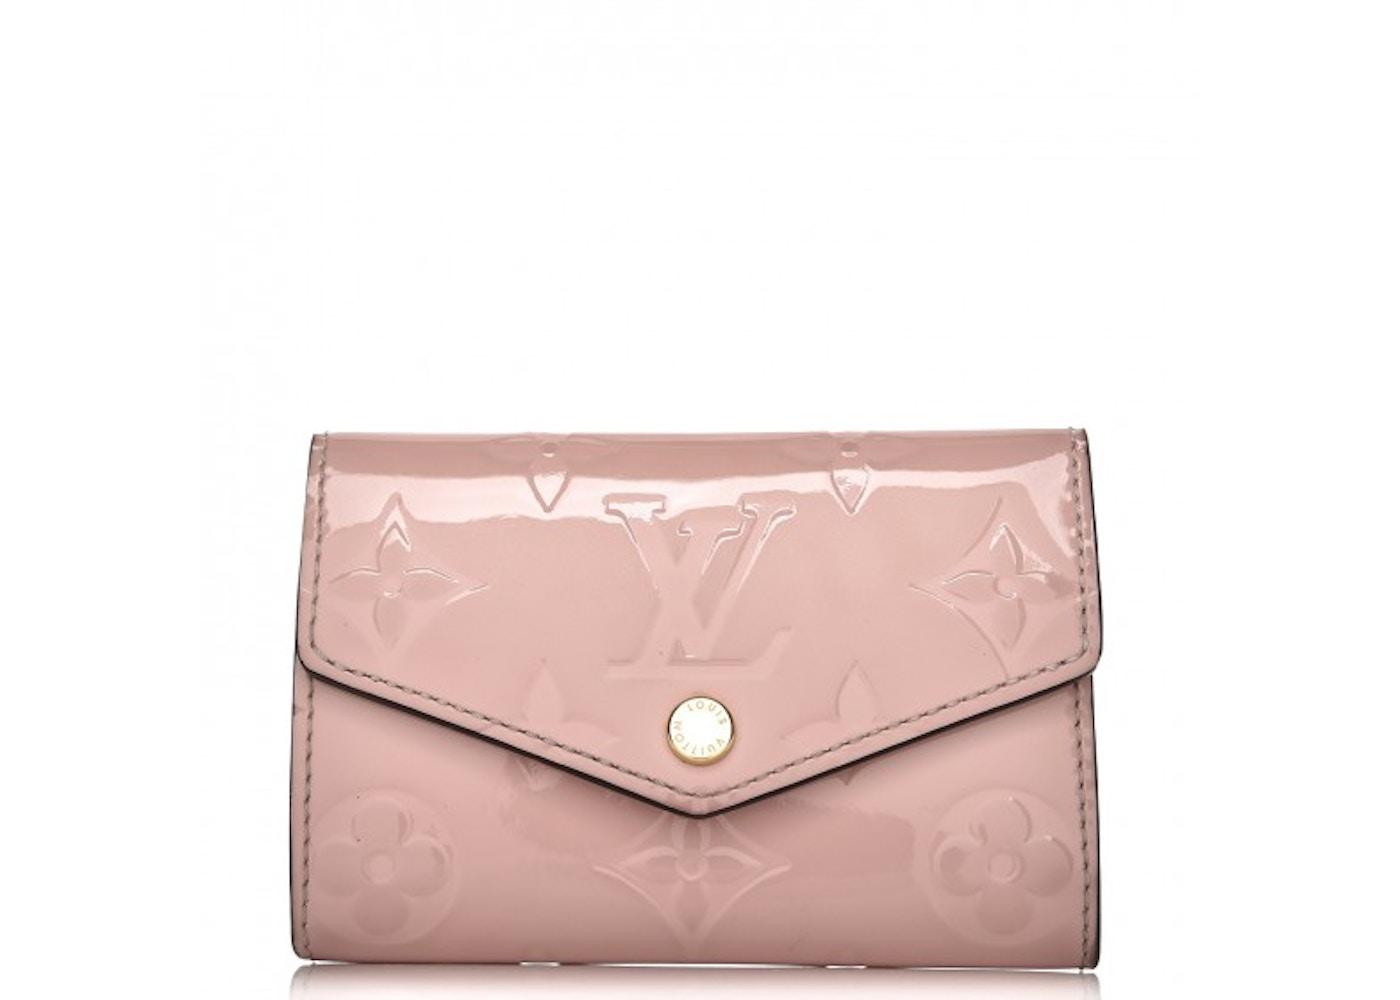 56badecb59 Louis Vuitton Key Holder Multicles 6 Monogram Vernis Rose Ballerine